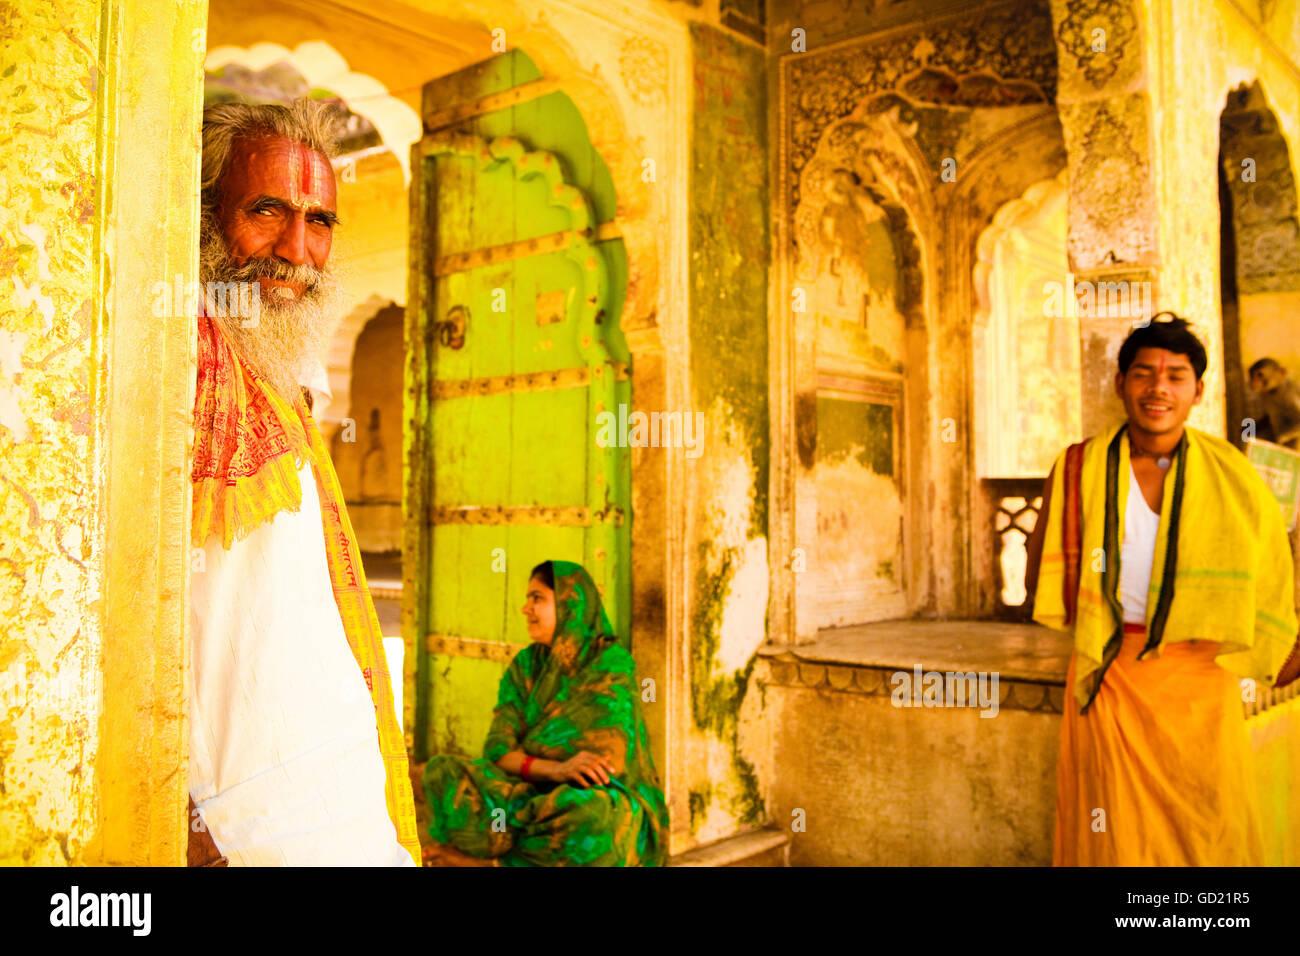 Scuola di sanscrito professore, Jaipur, Rajasthan, India, Asia Immagini Stock